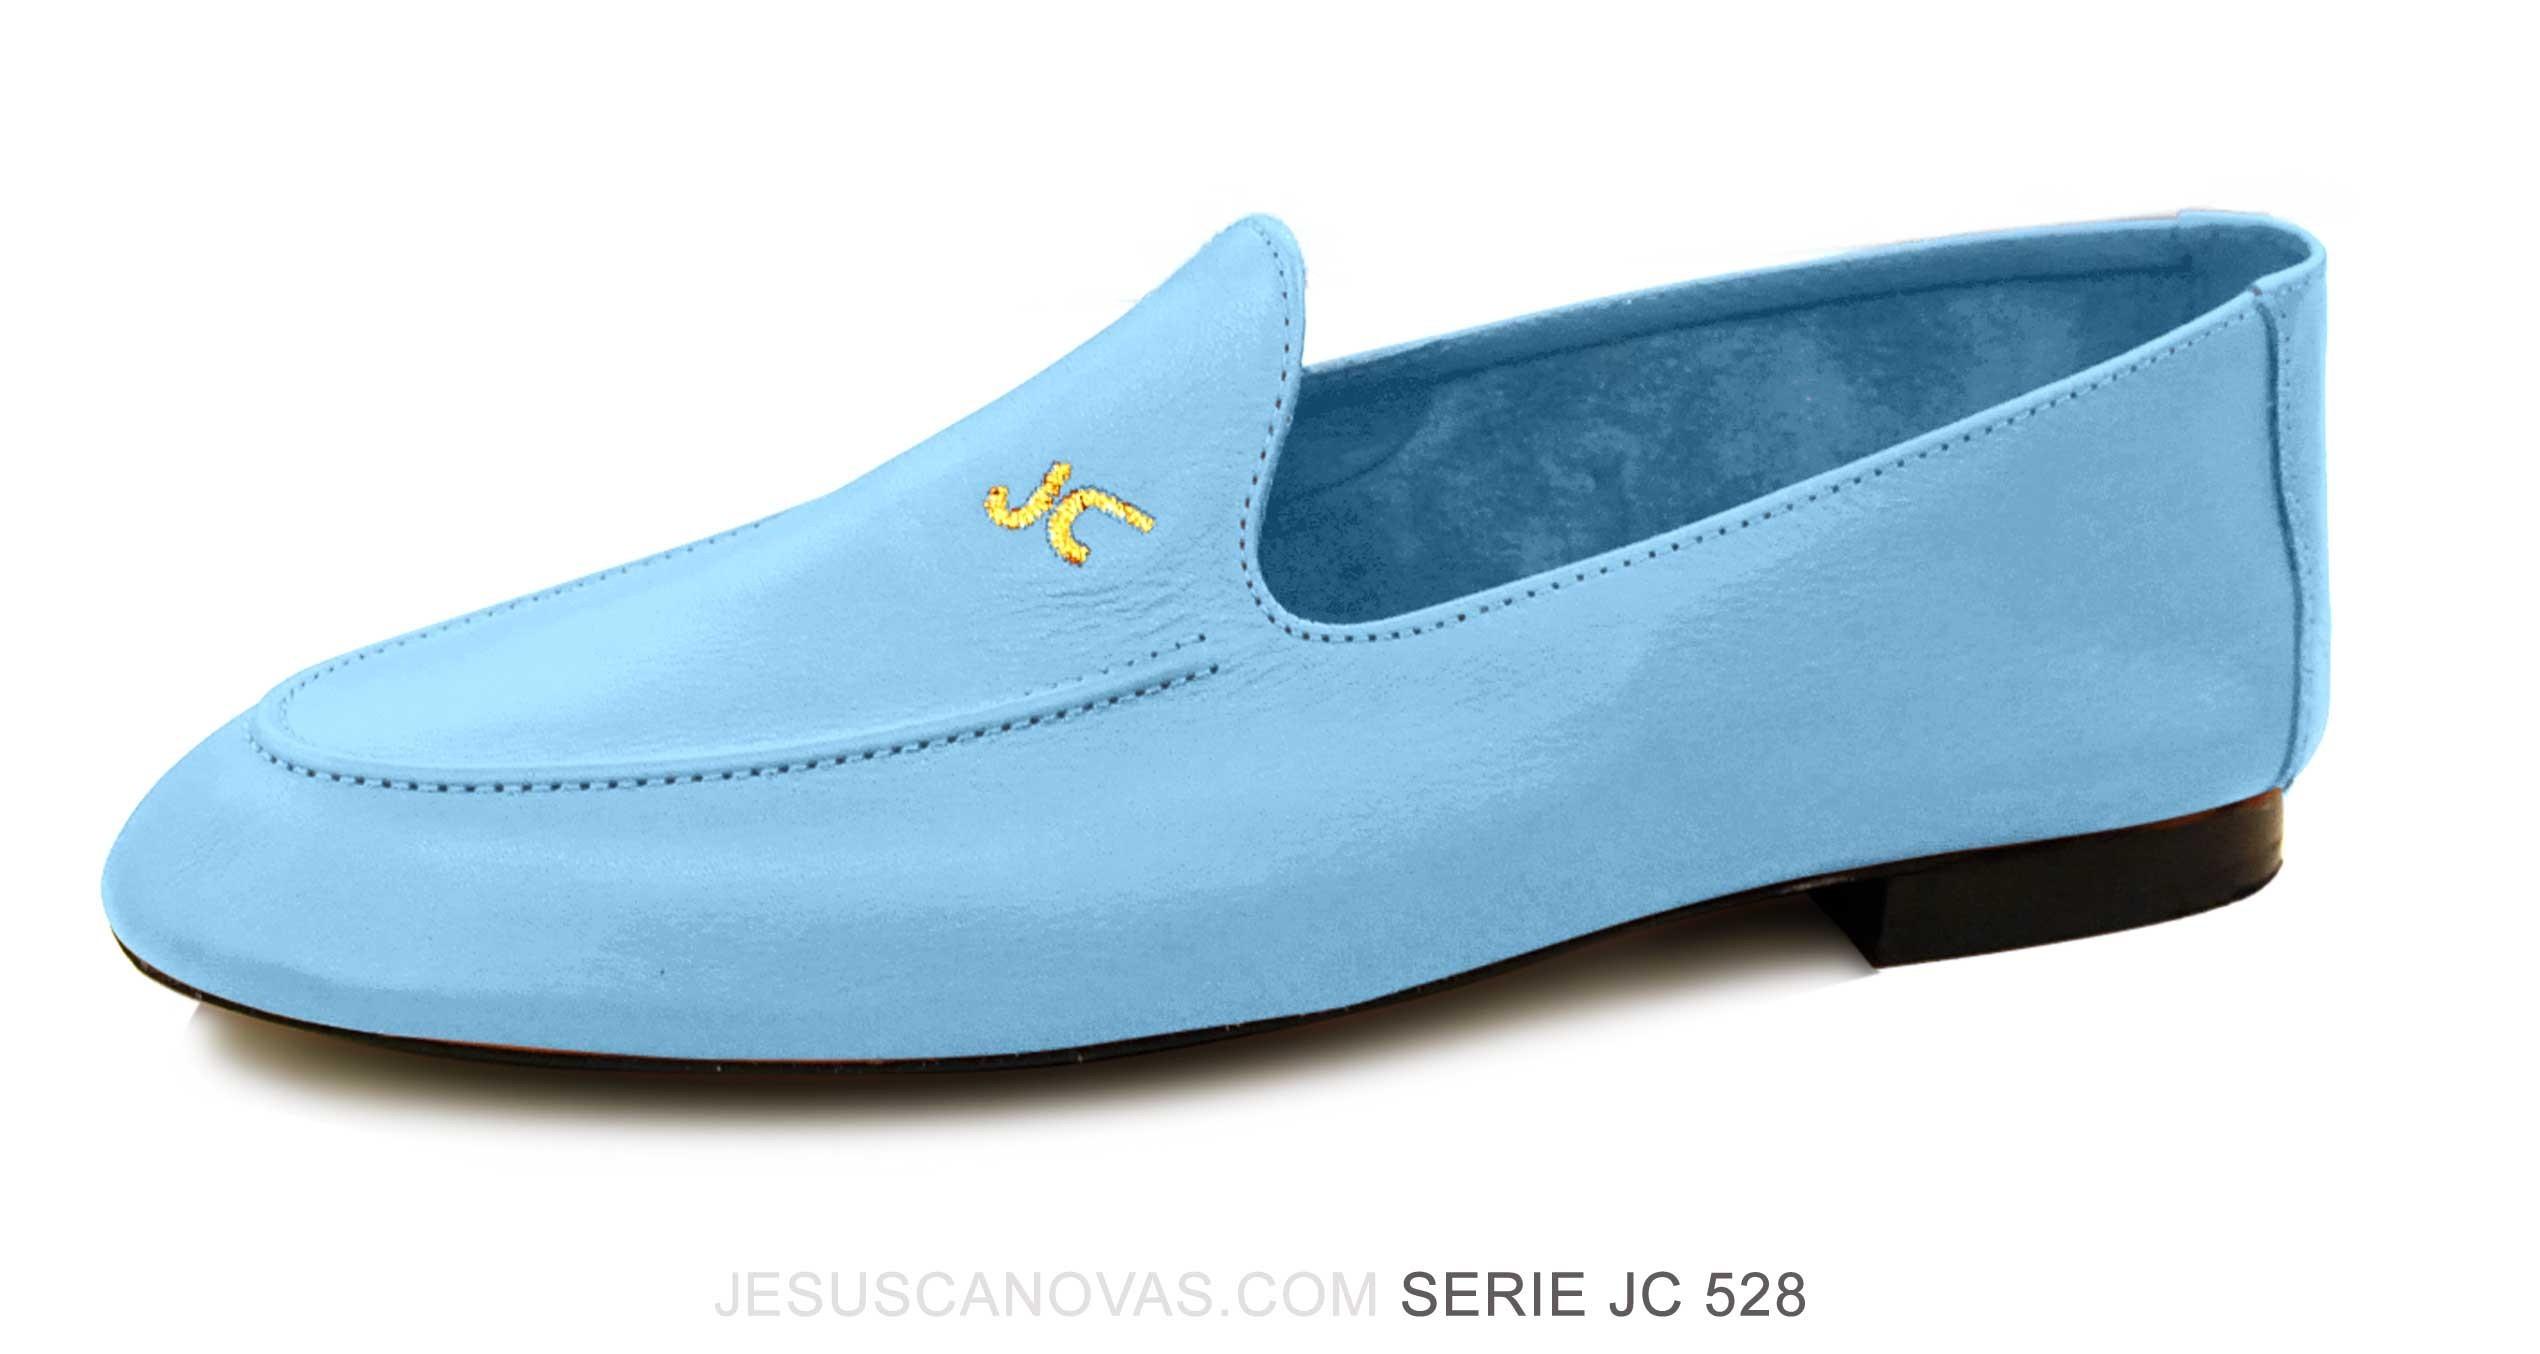 Foto 5 de Zapatos Julio Iglesias 528 JC Guardamar Napa